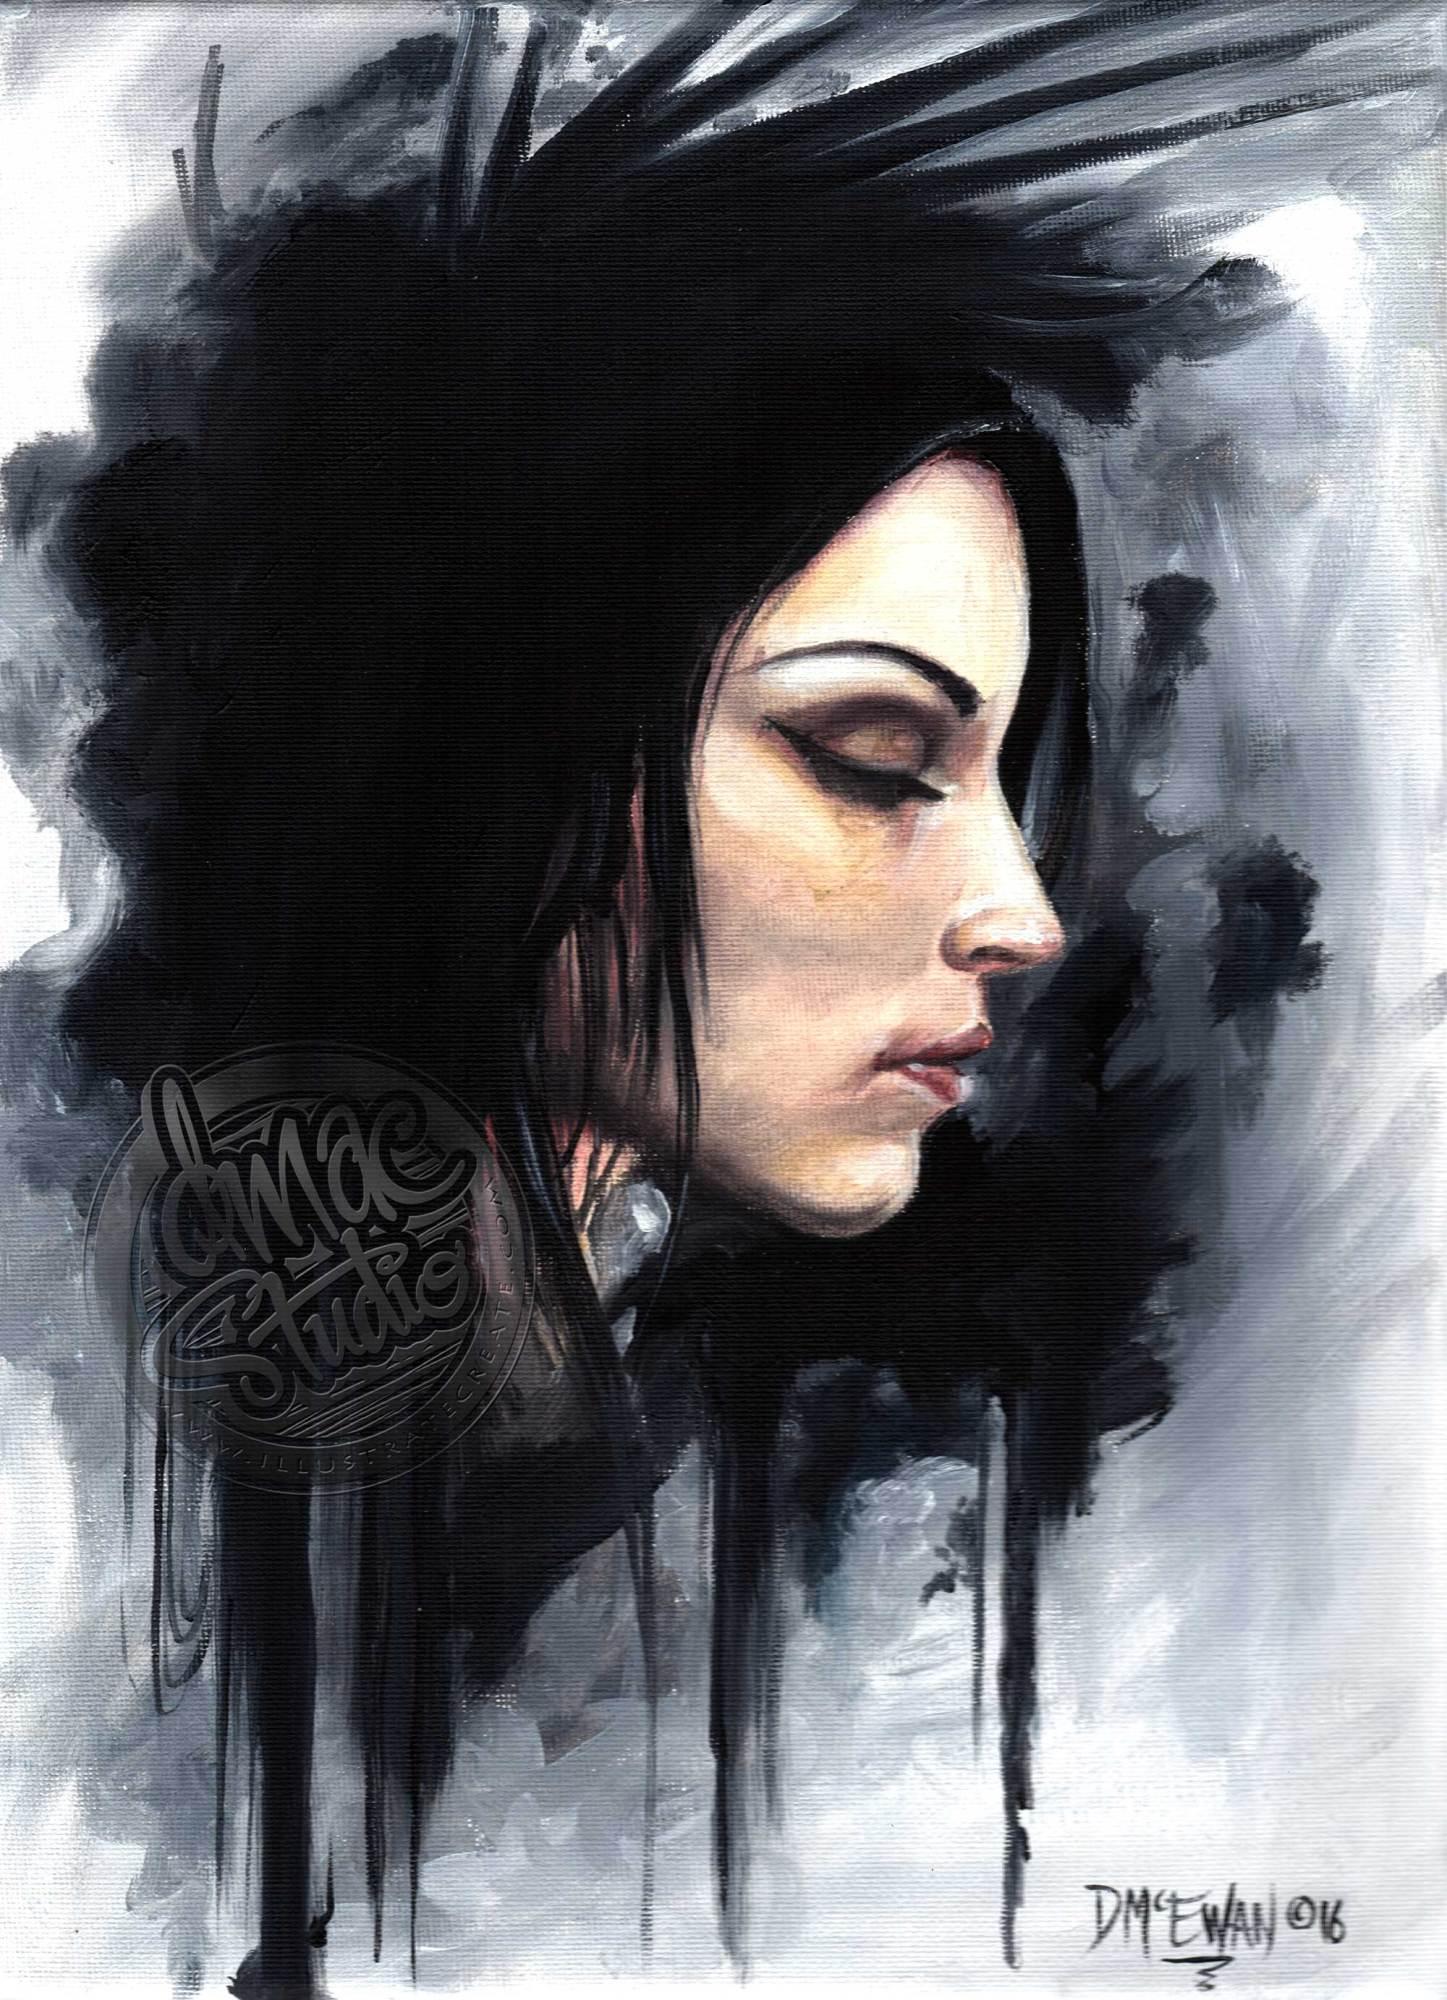 Original art by Dave McEwan